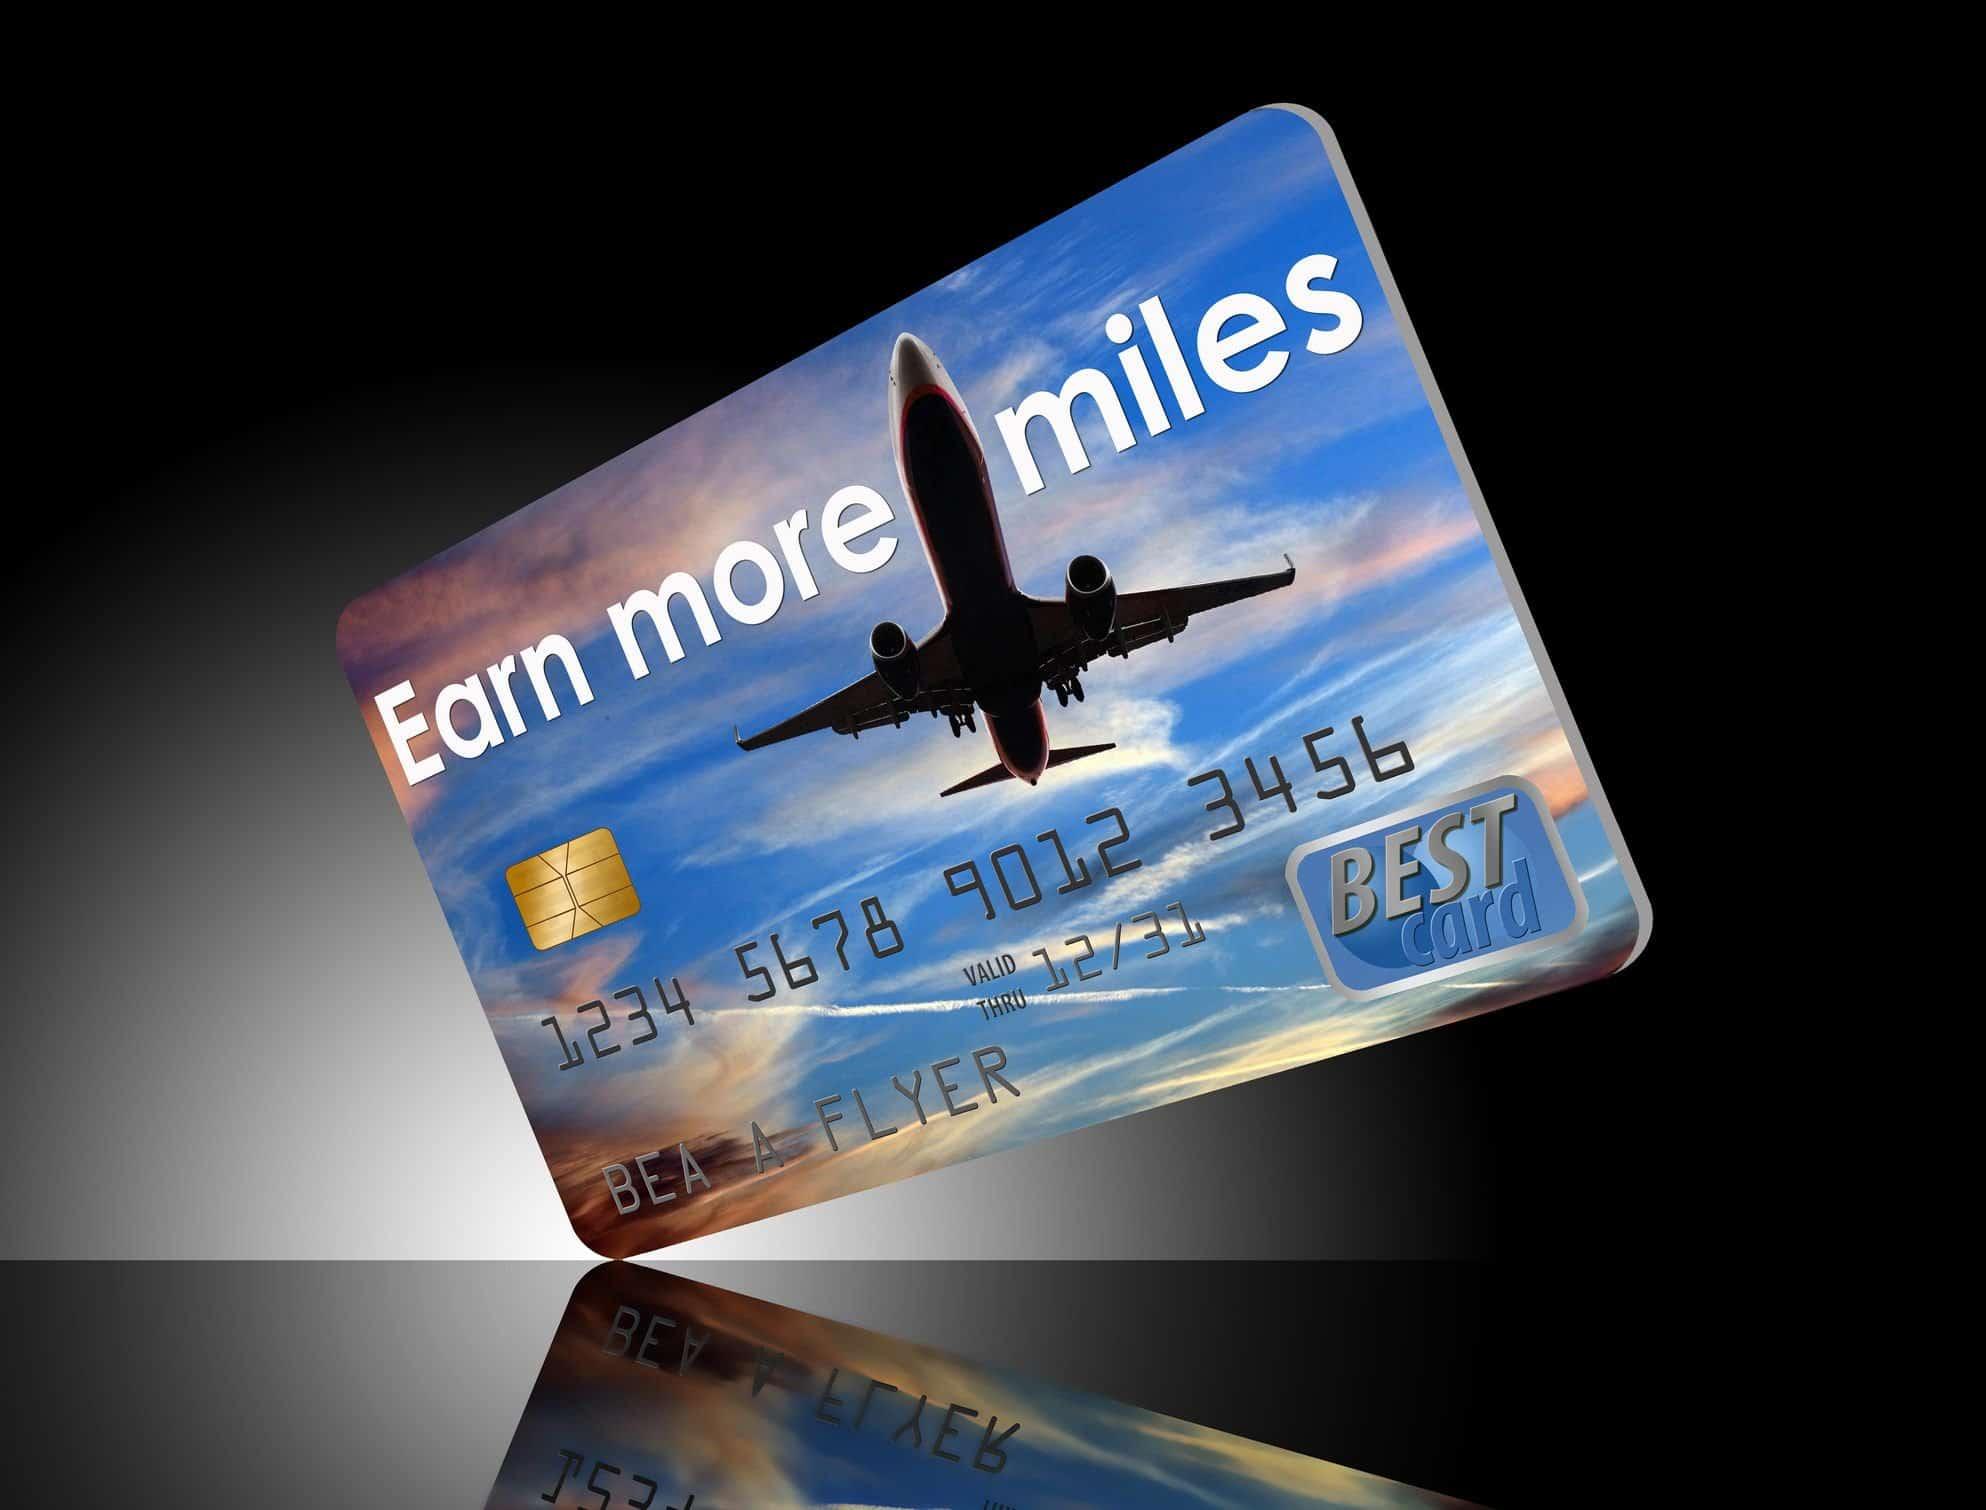 Generic Airline Miles Card